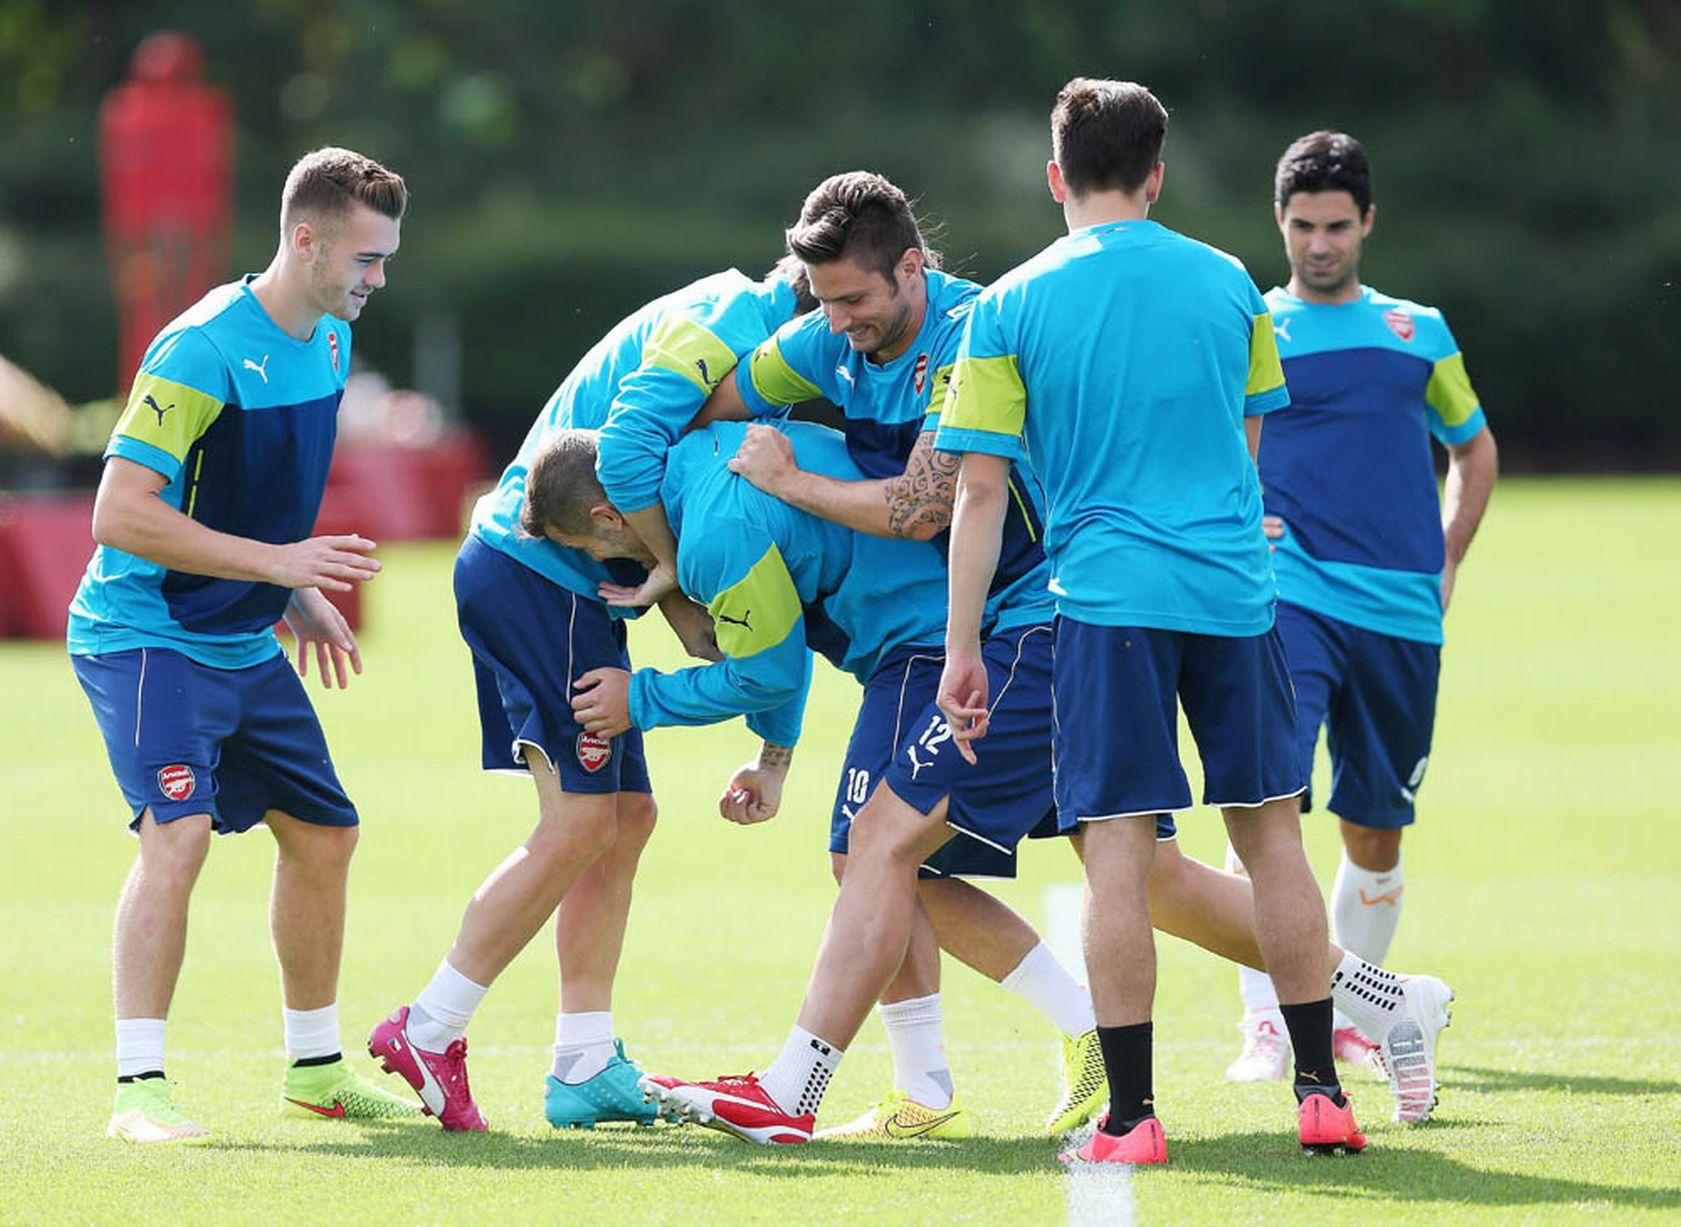 Arsenal-Training-Pics 5